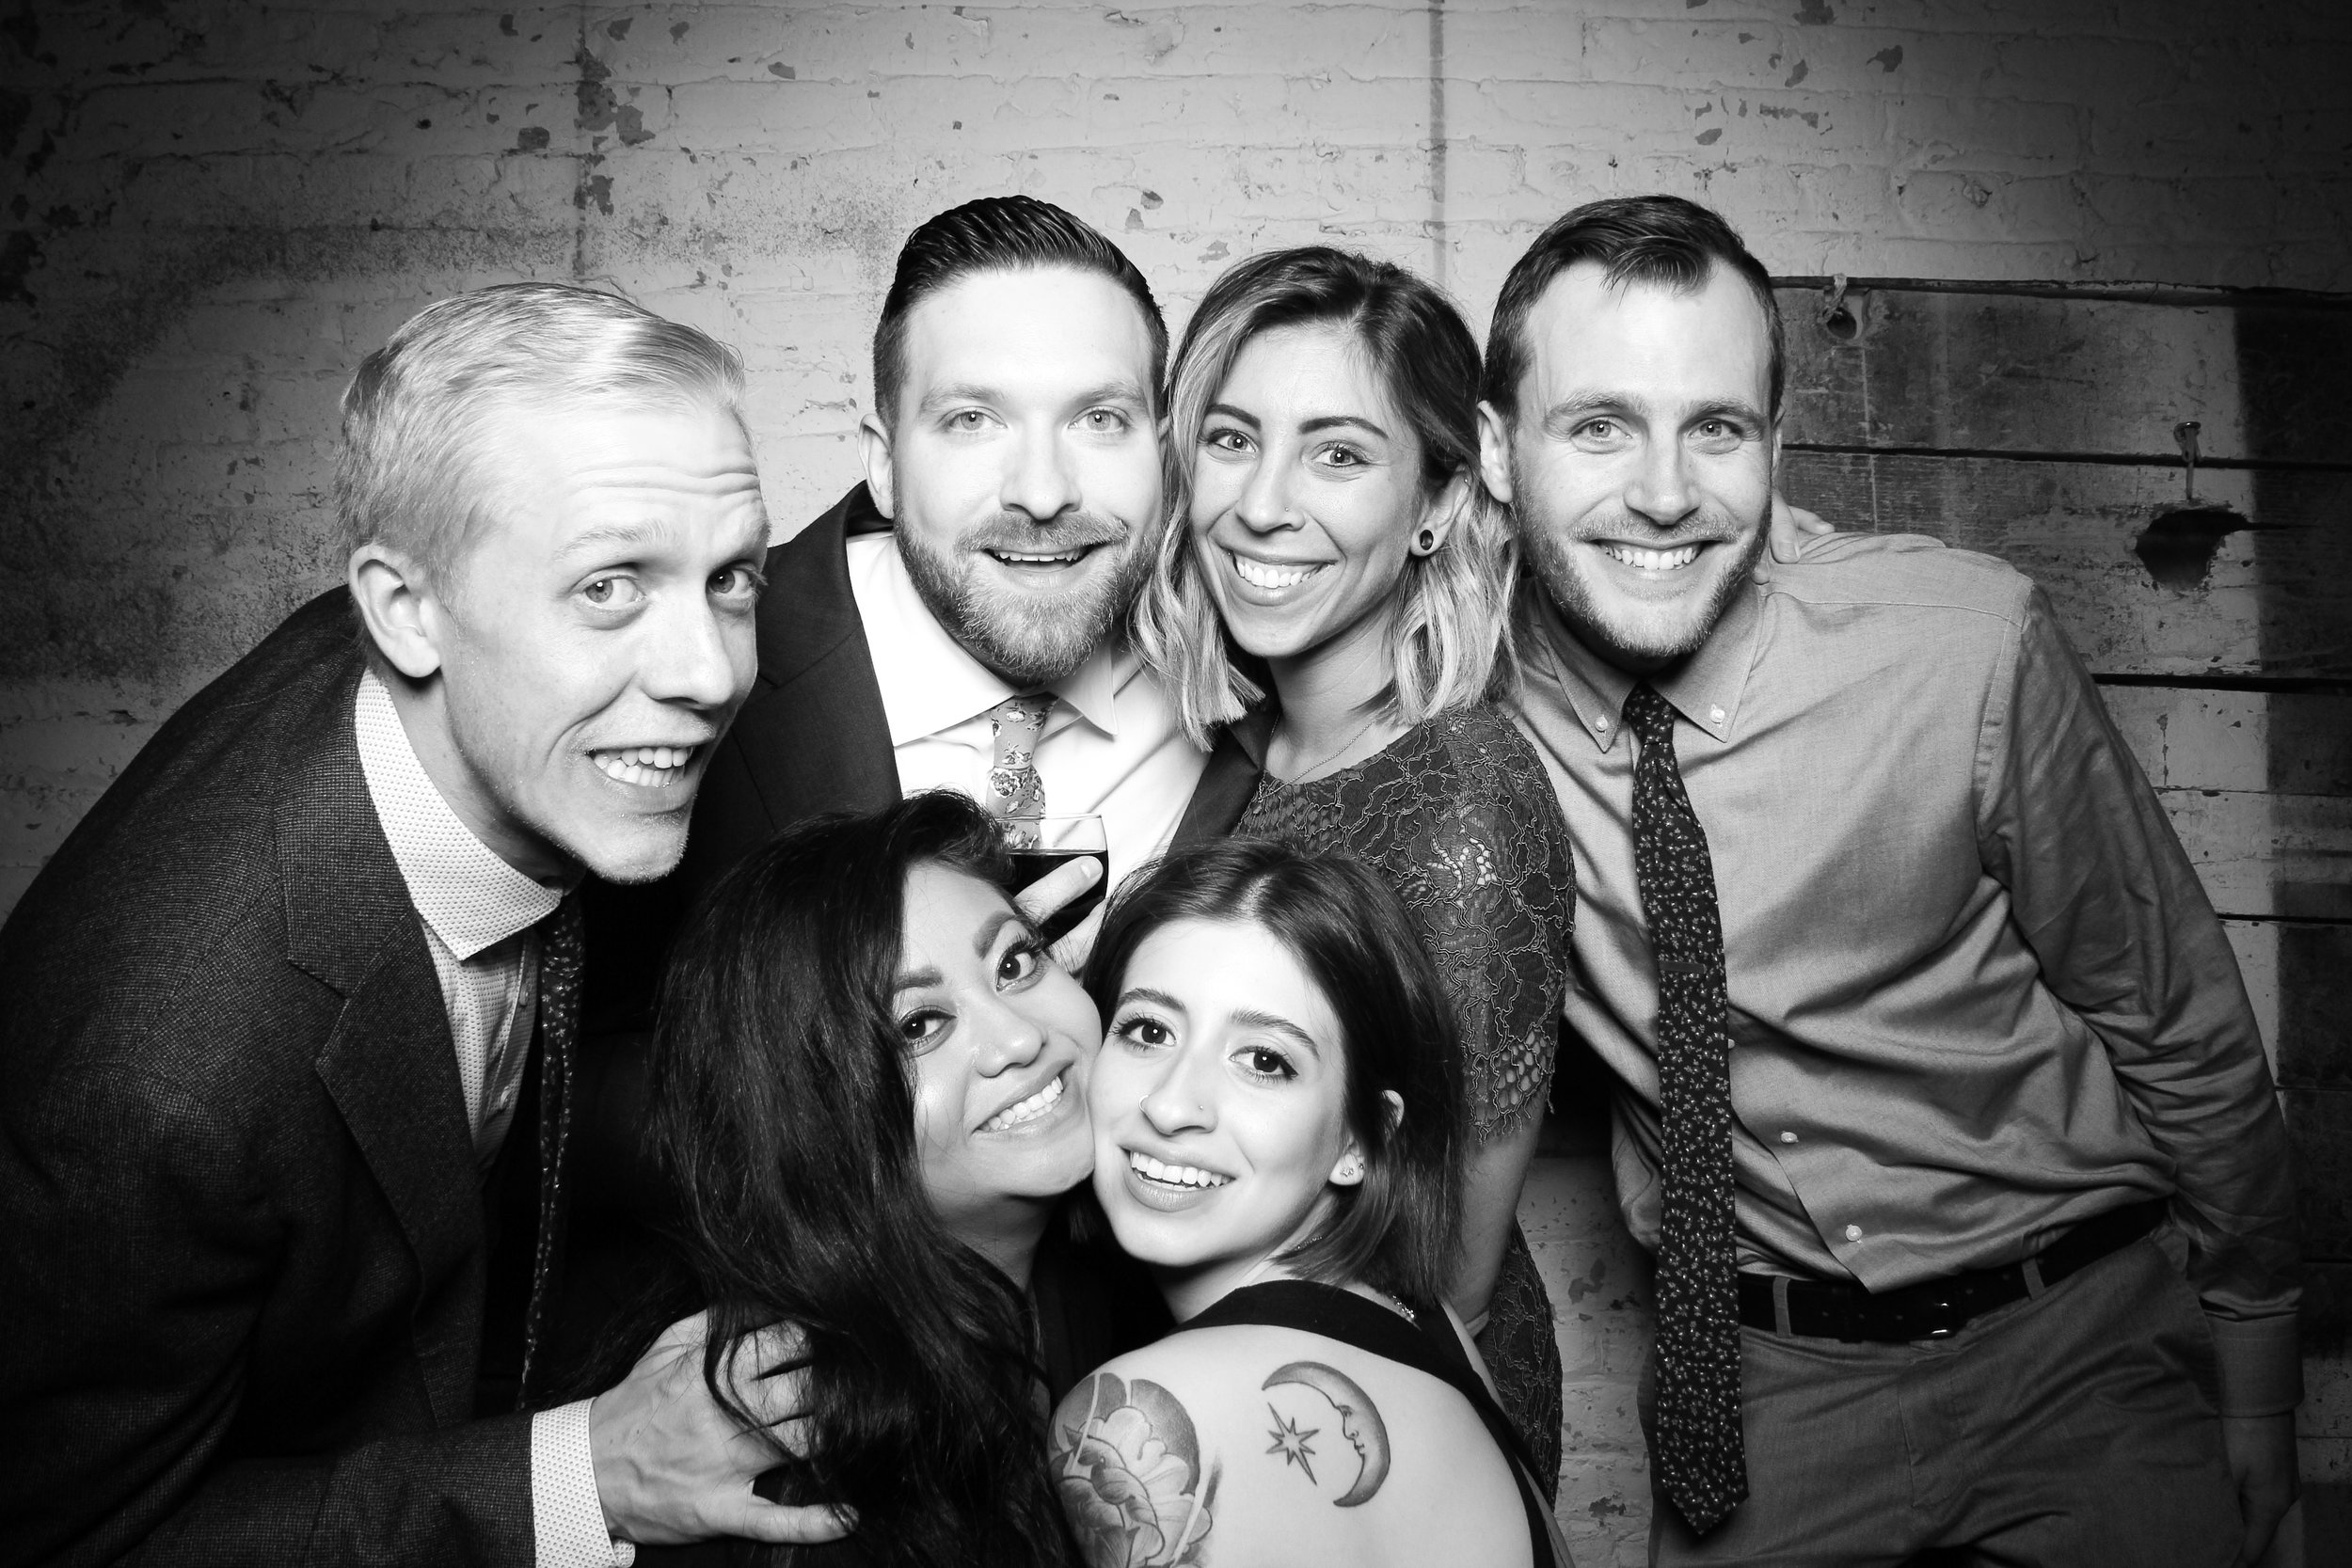 The_Joinery_Wedding_Venue_Logan_Square_Reception_06.jpg